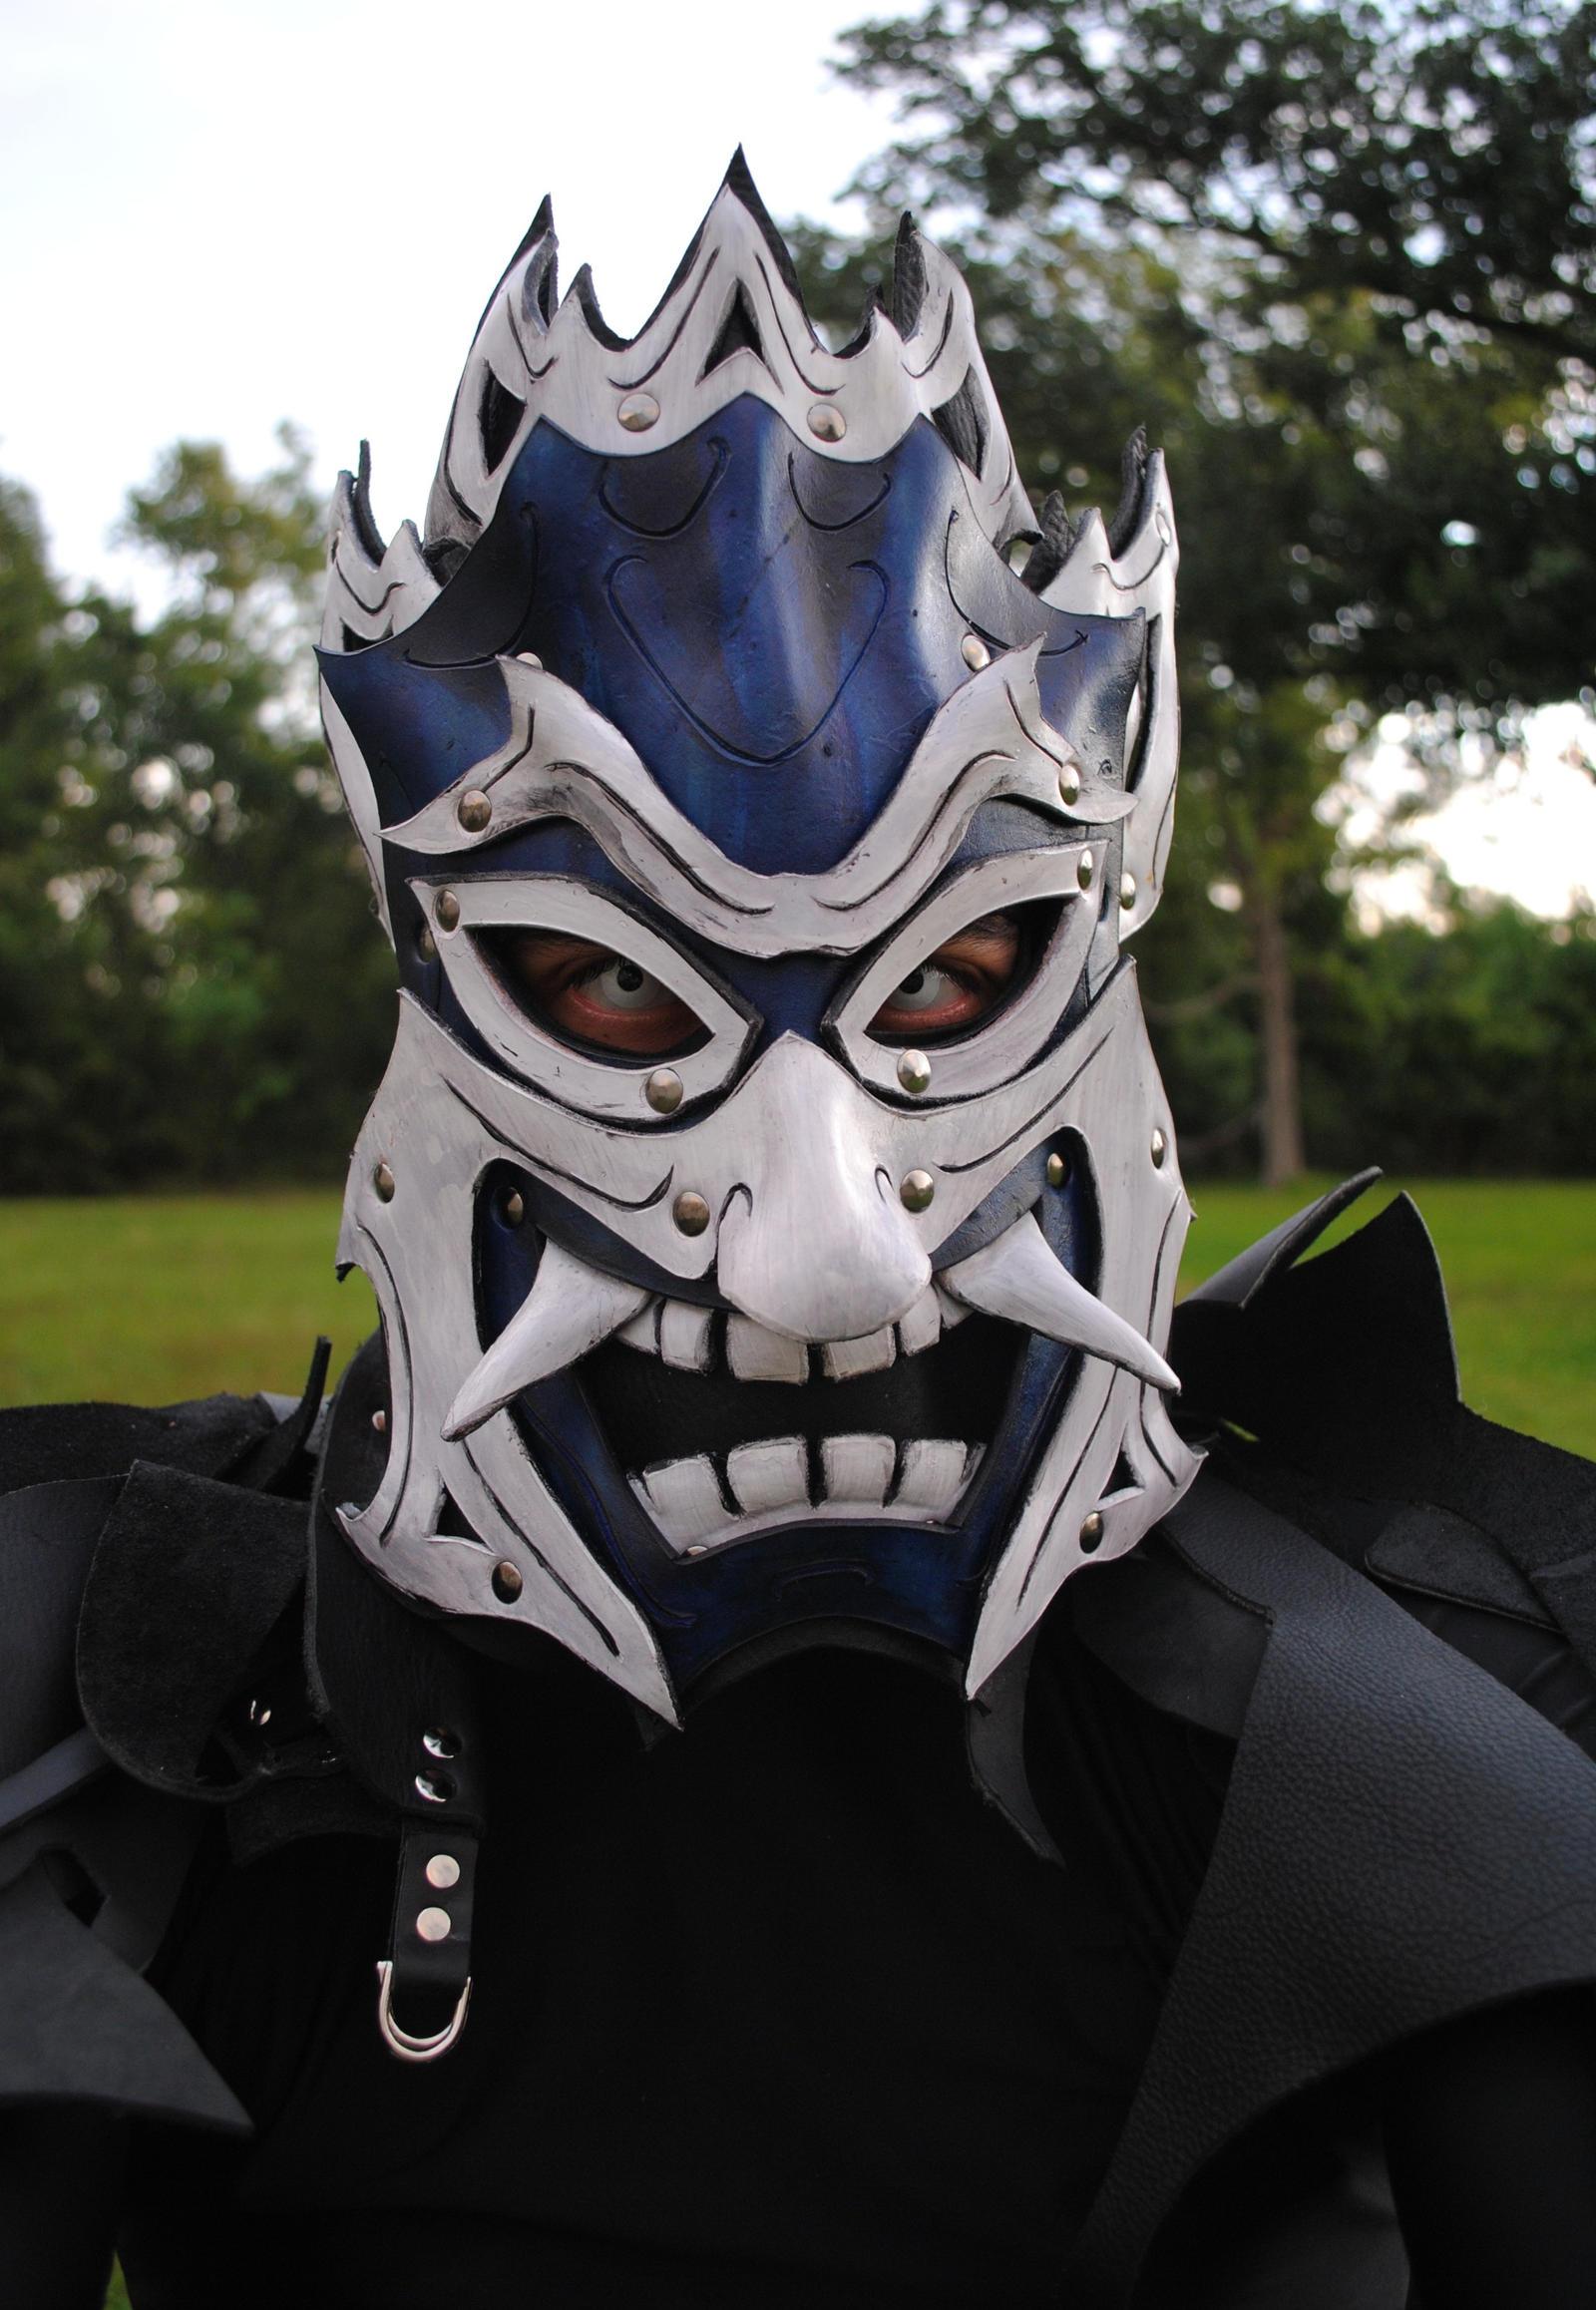 Zuko: Blue Spirit Leather Mask by Epic-Leather